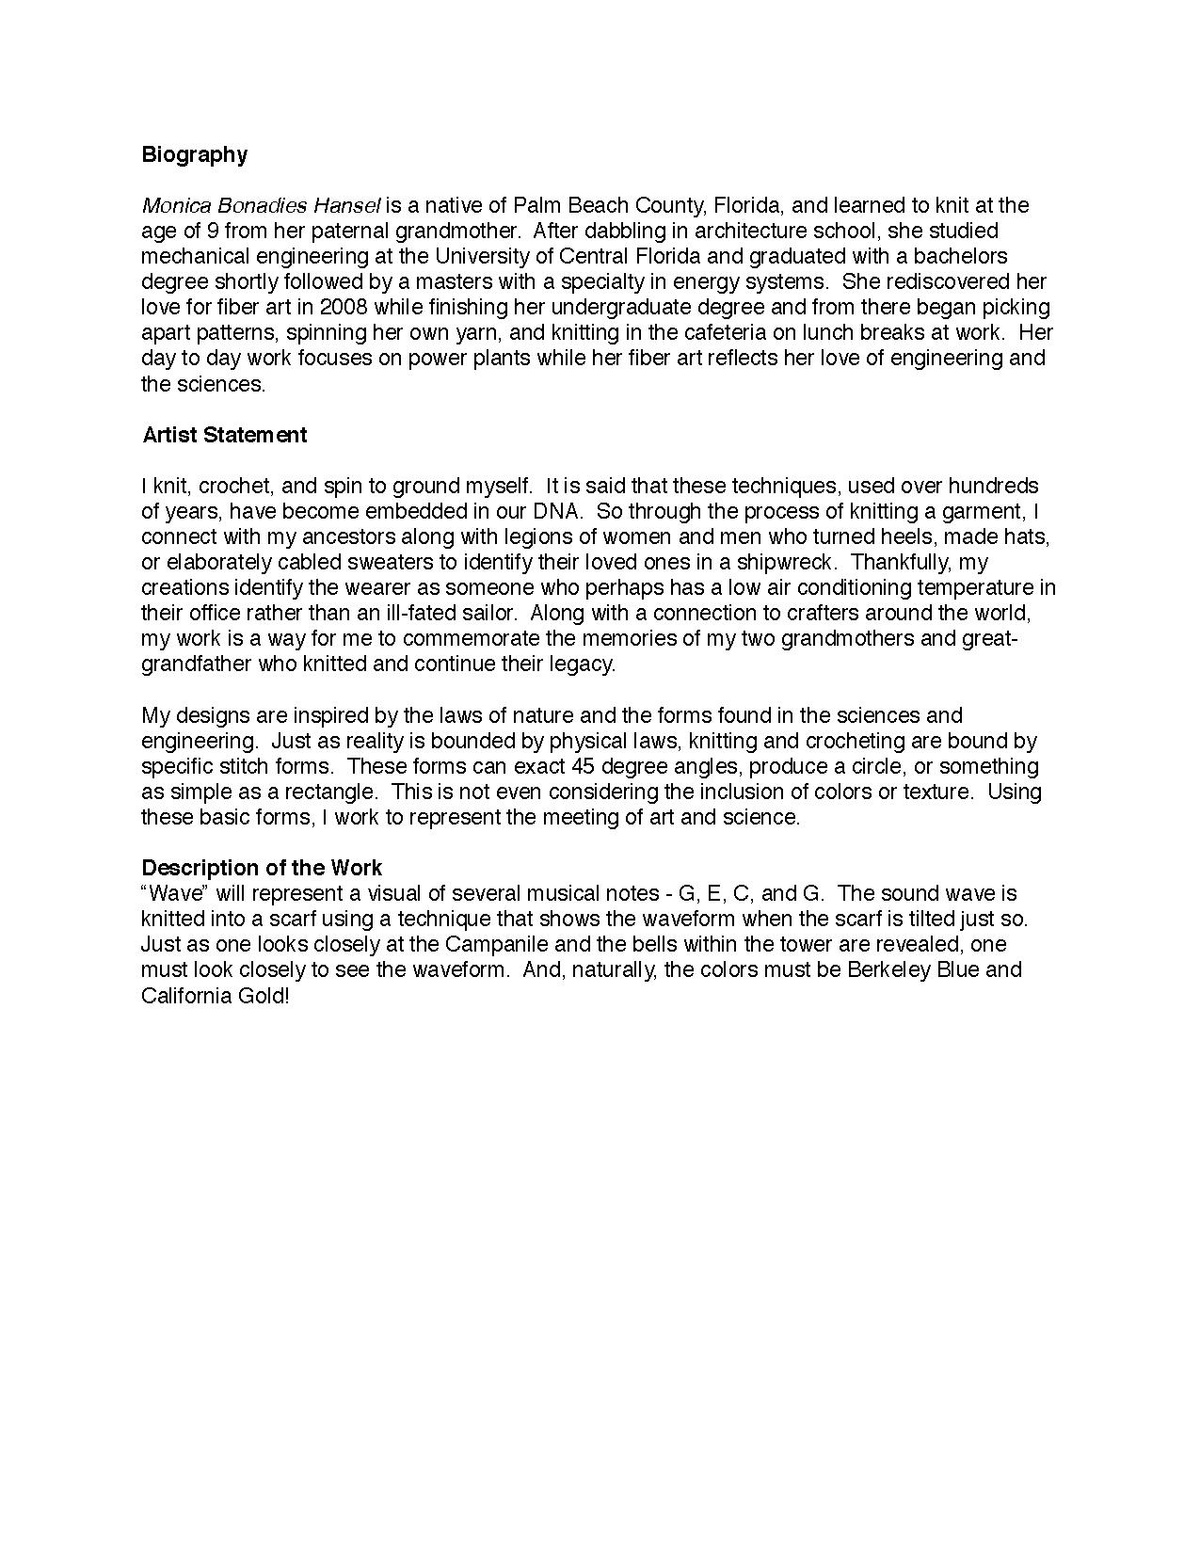 cover letter wikipedia